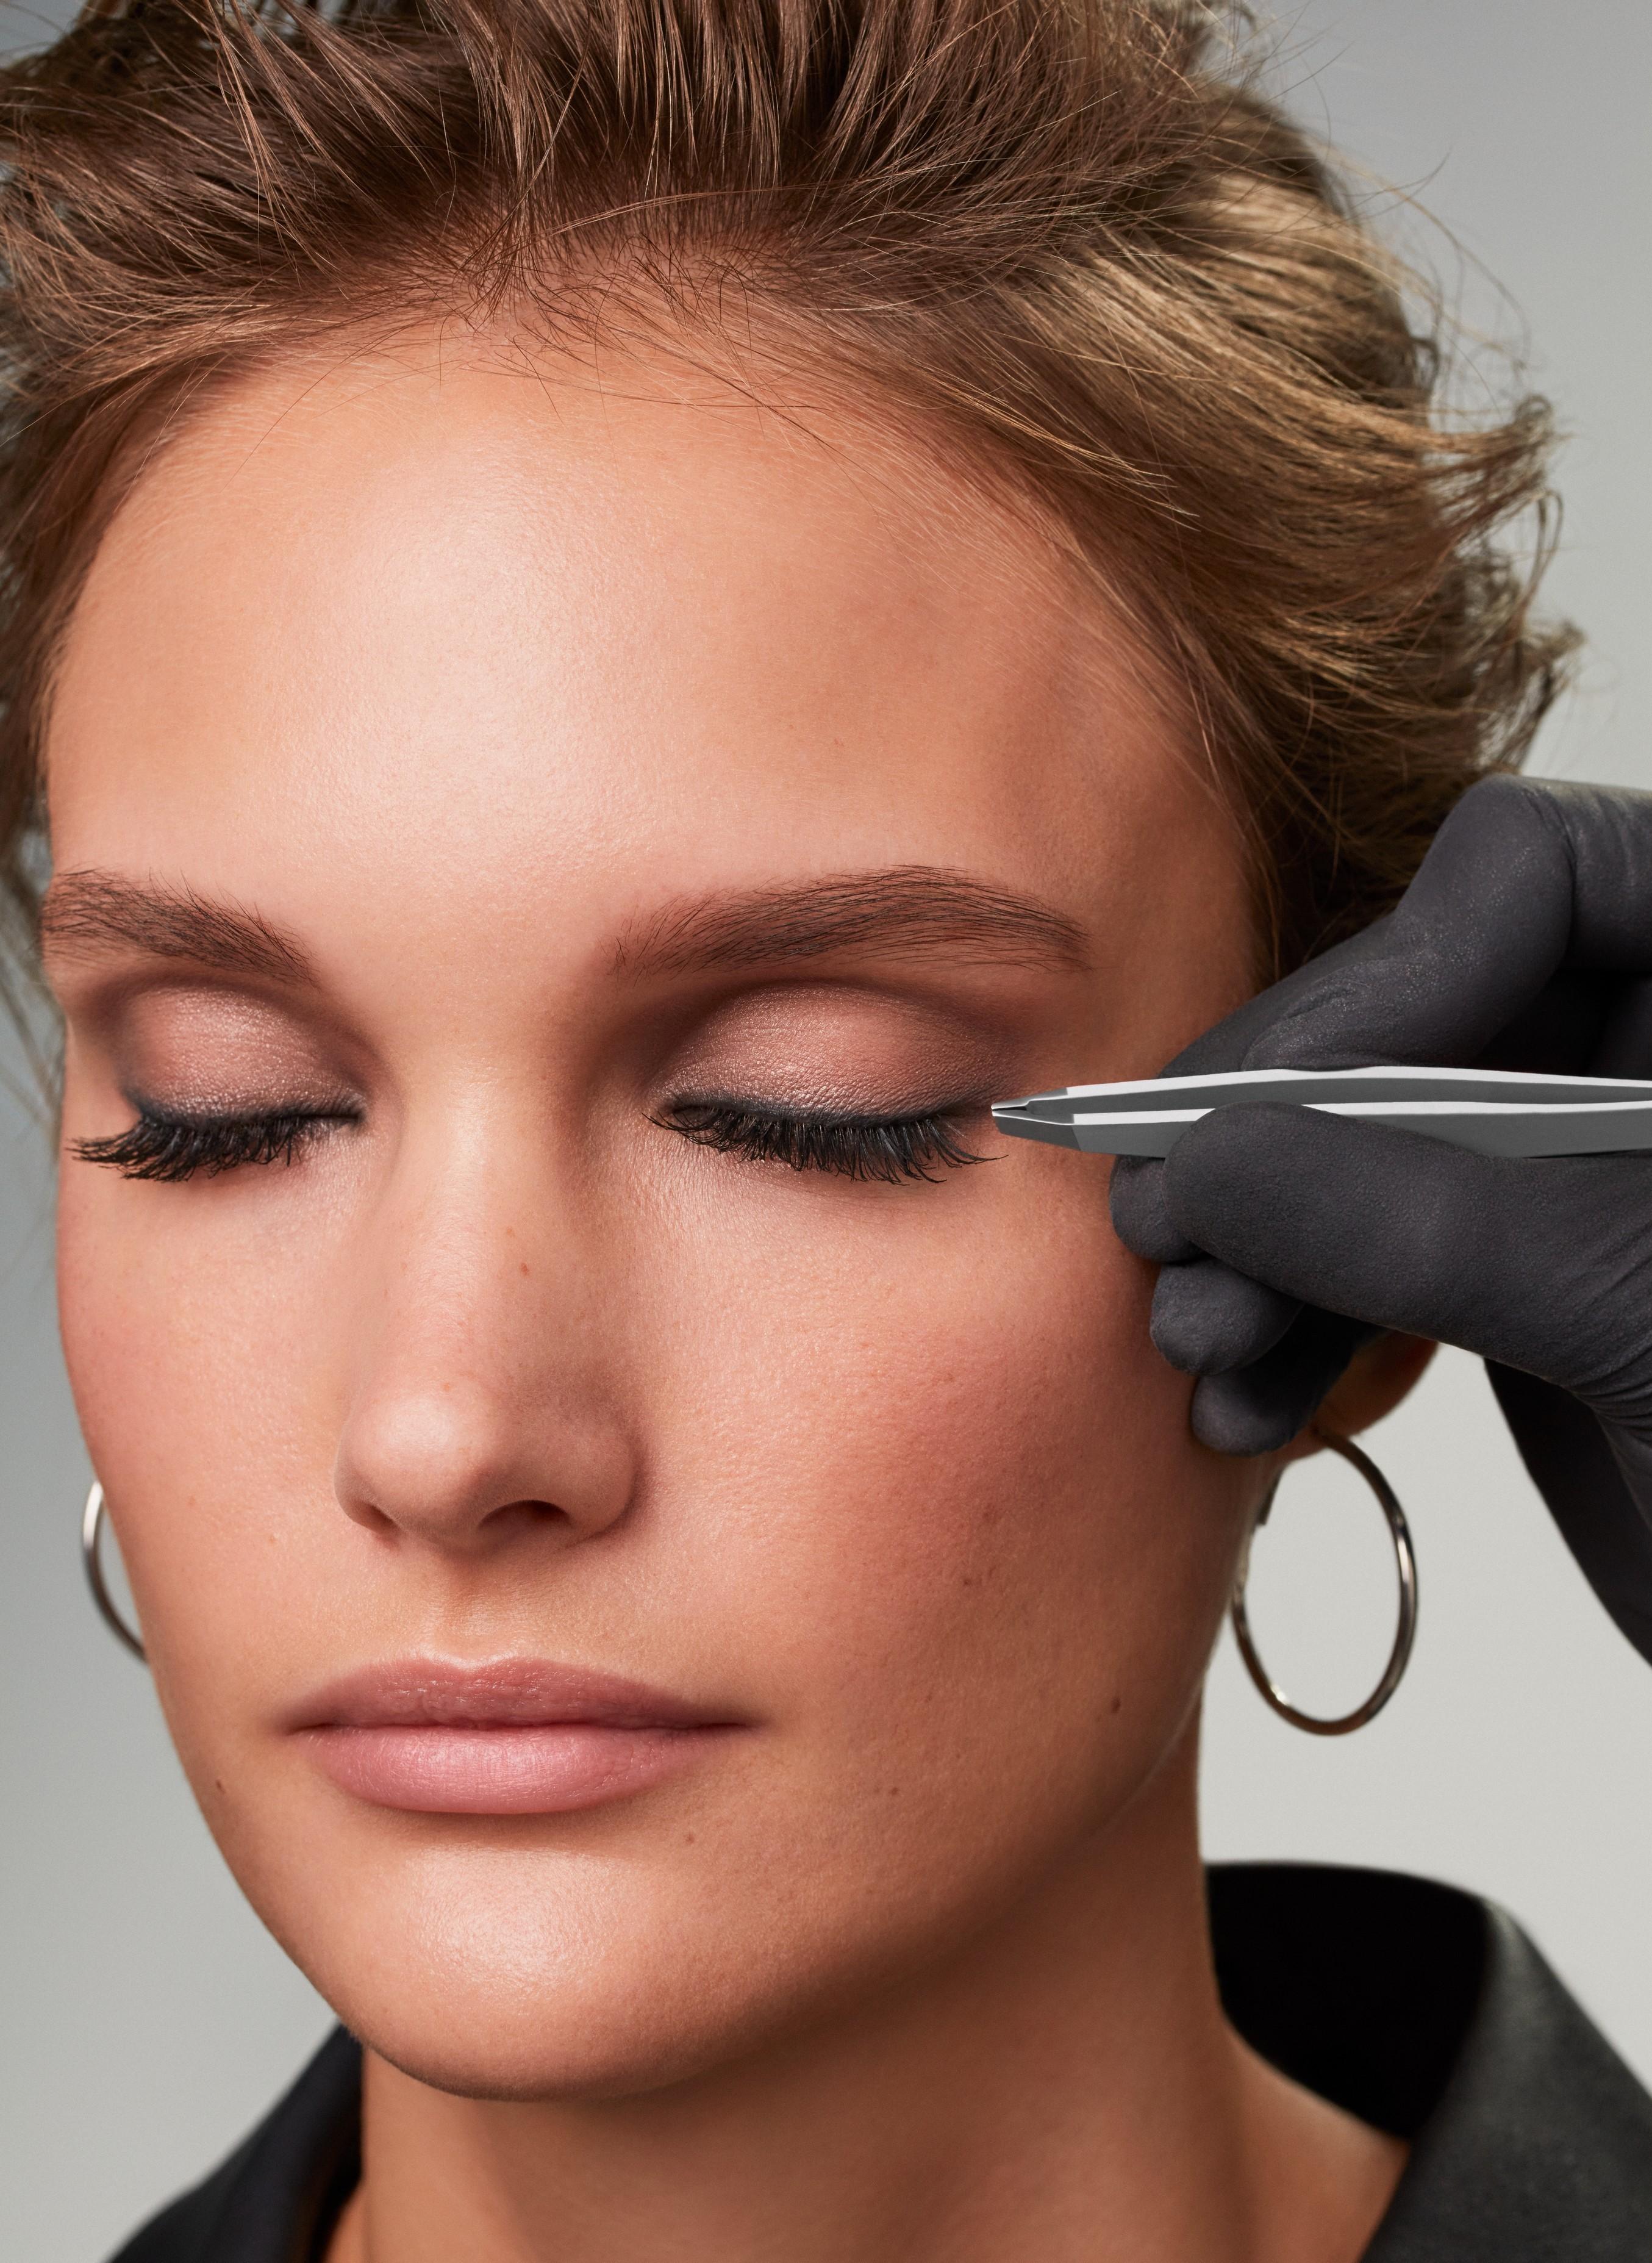 Makeup-application-4-smokey-eyes-062023-Web-Rendition